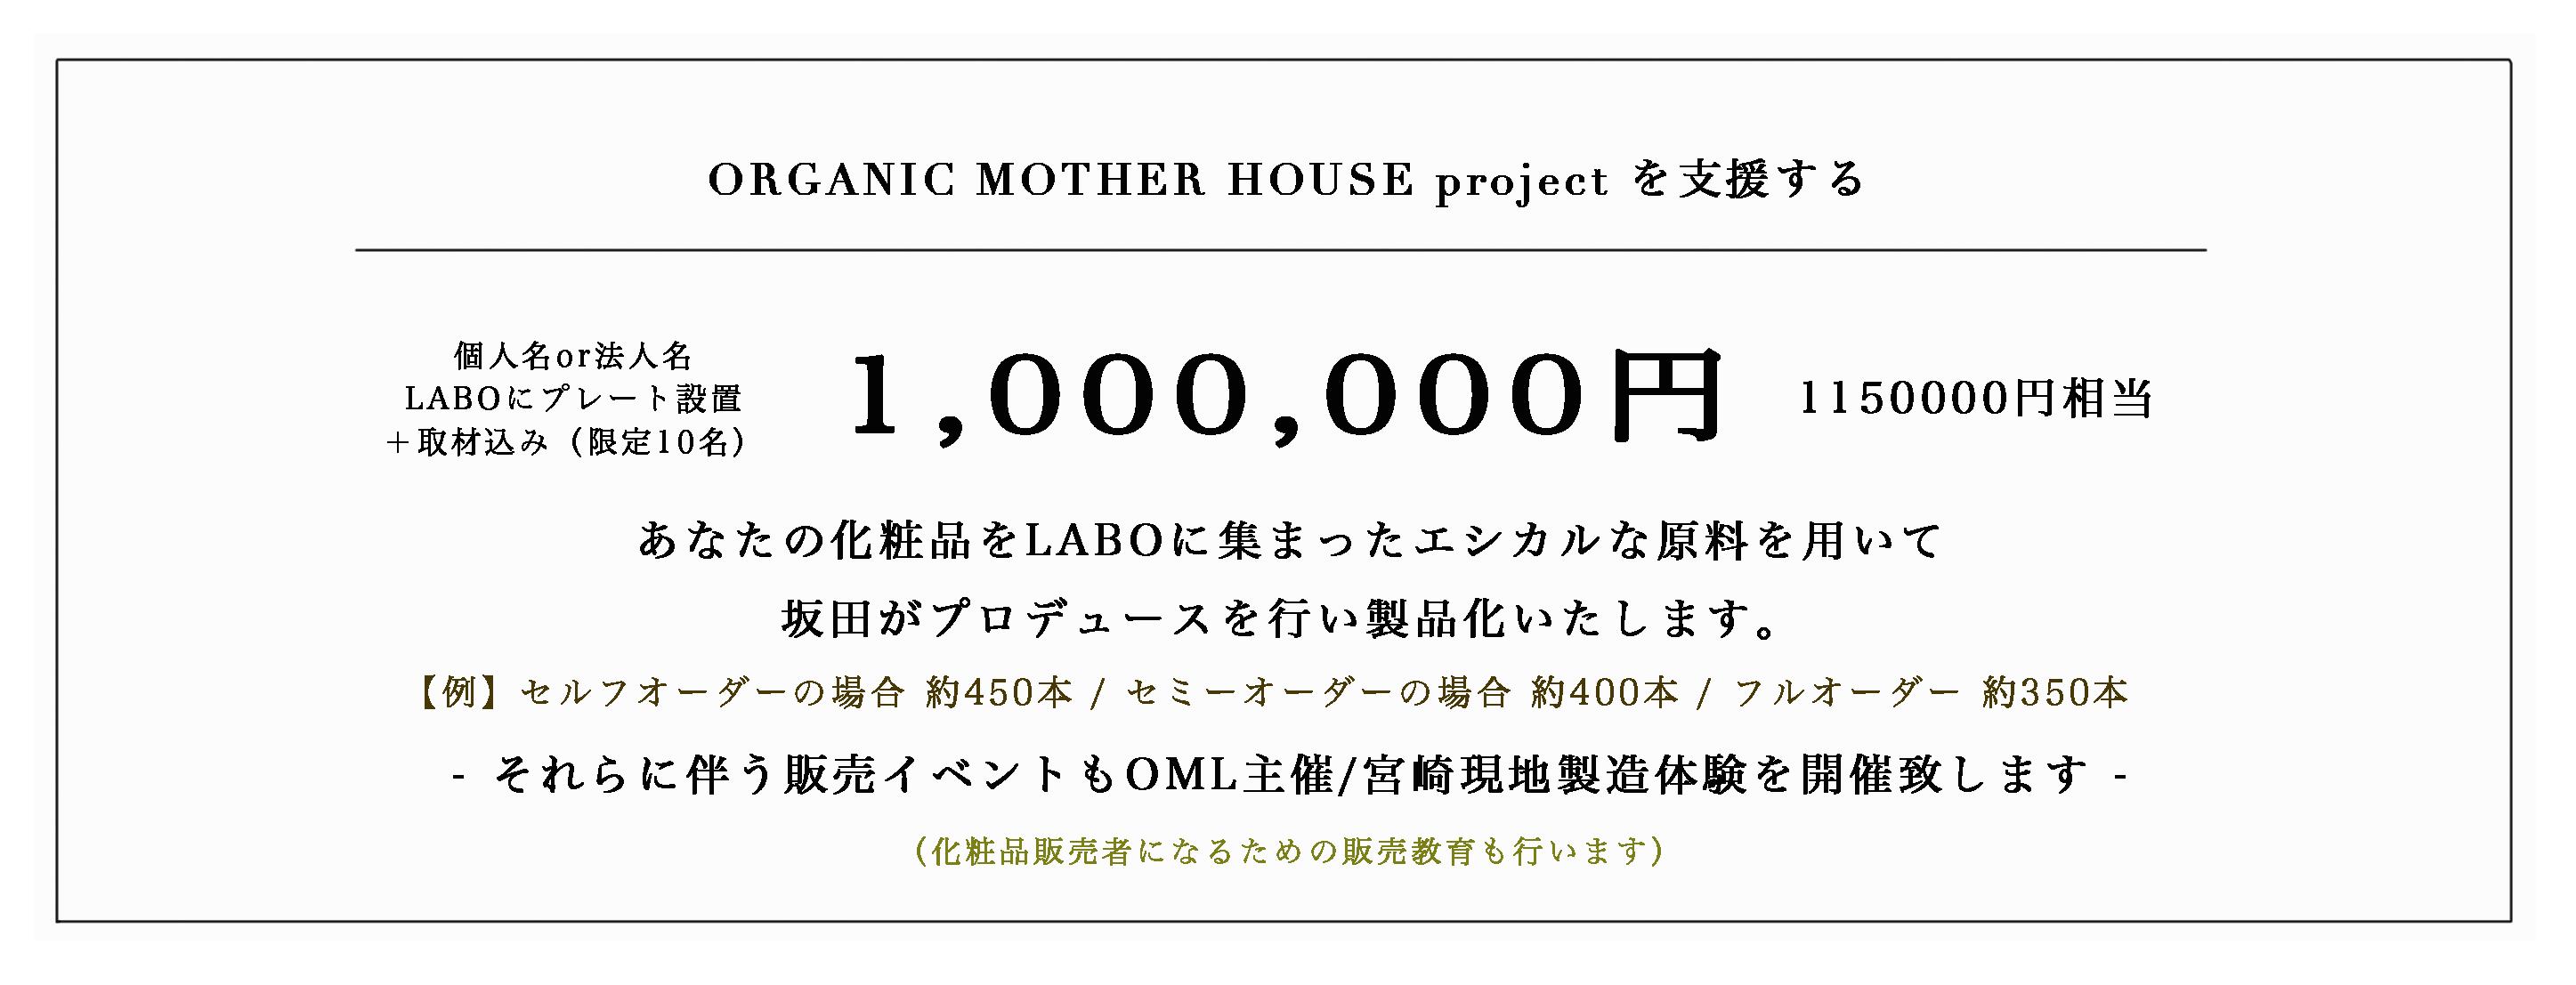 ORGANIC MOTHER HOUSE〈植物調合美容研究所〉100万